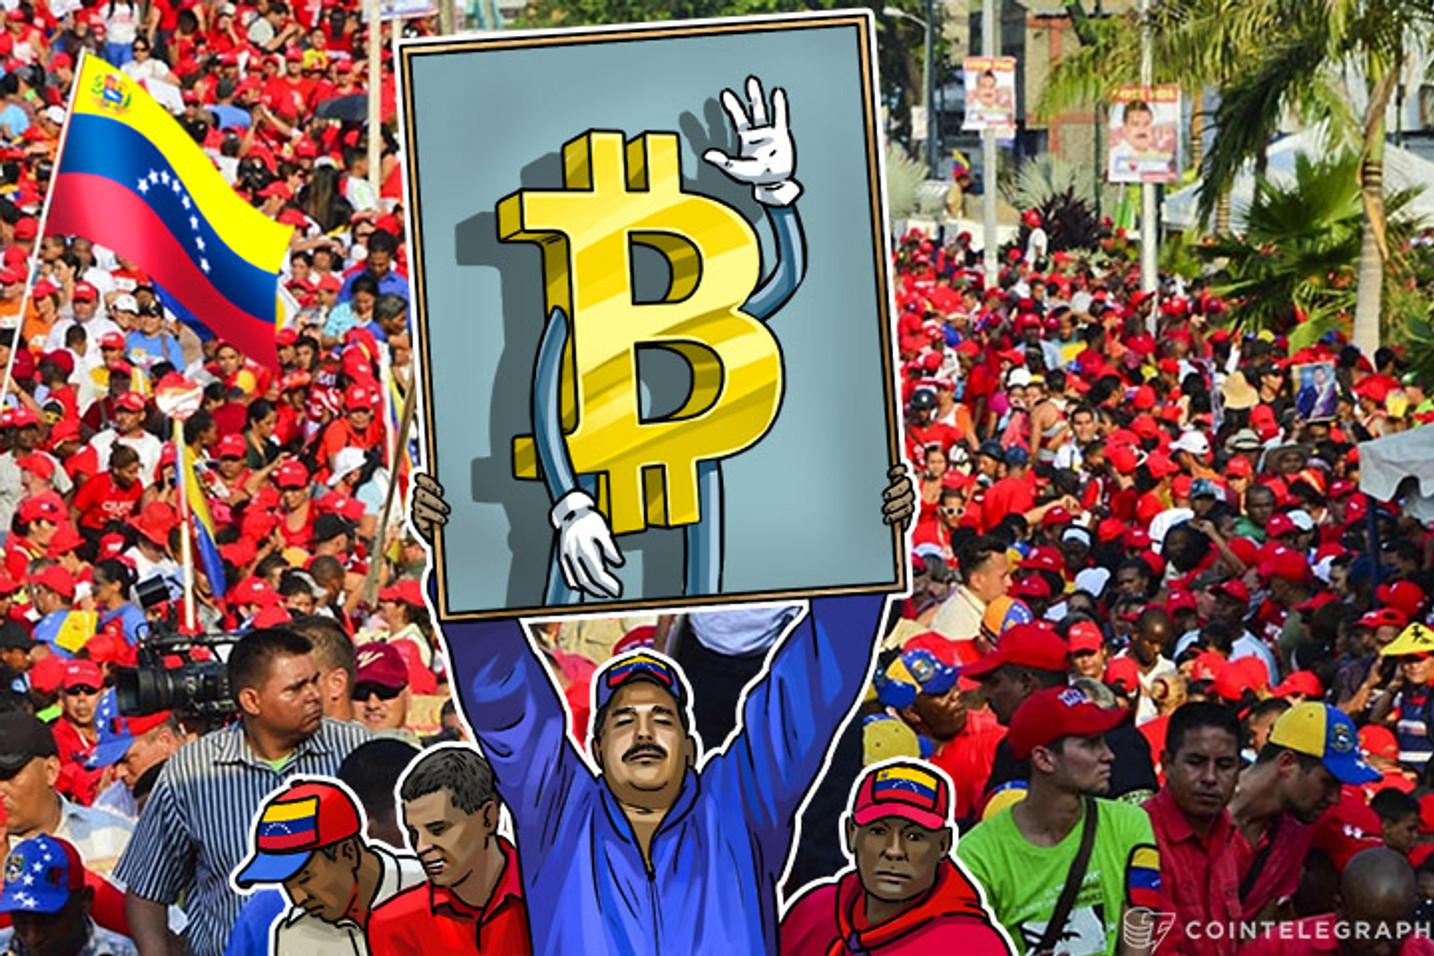 Venezuelans Rely on Bitcoin to Survive, Disregard Fiat Completely